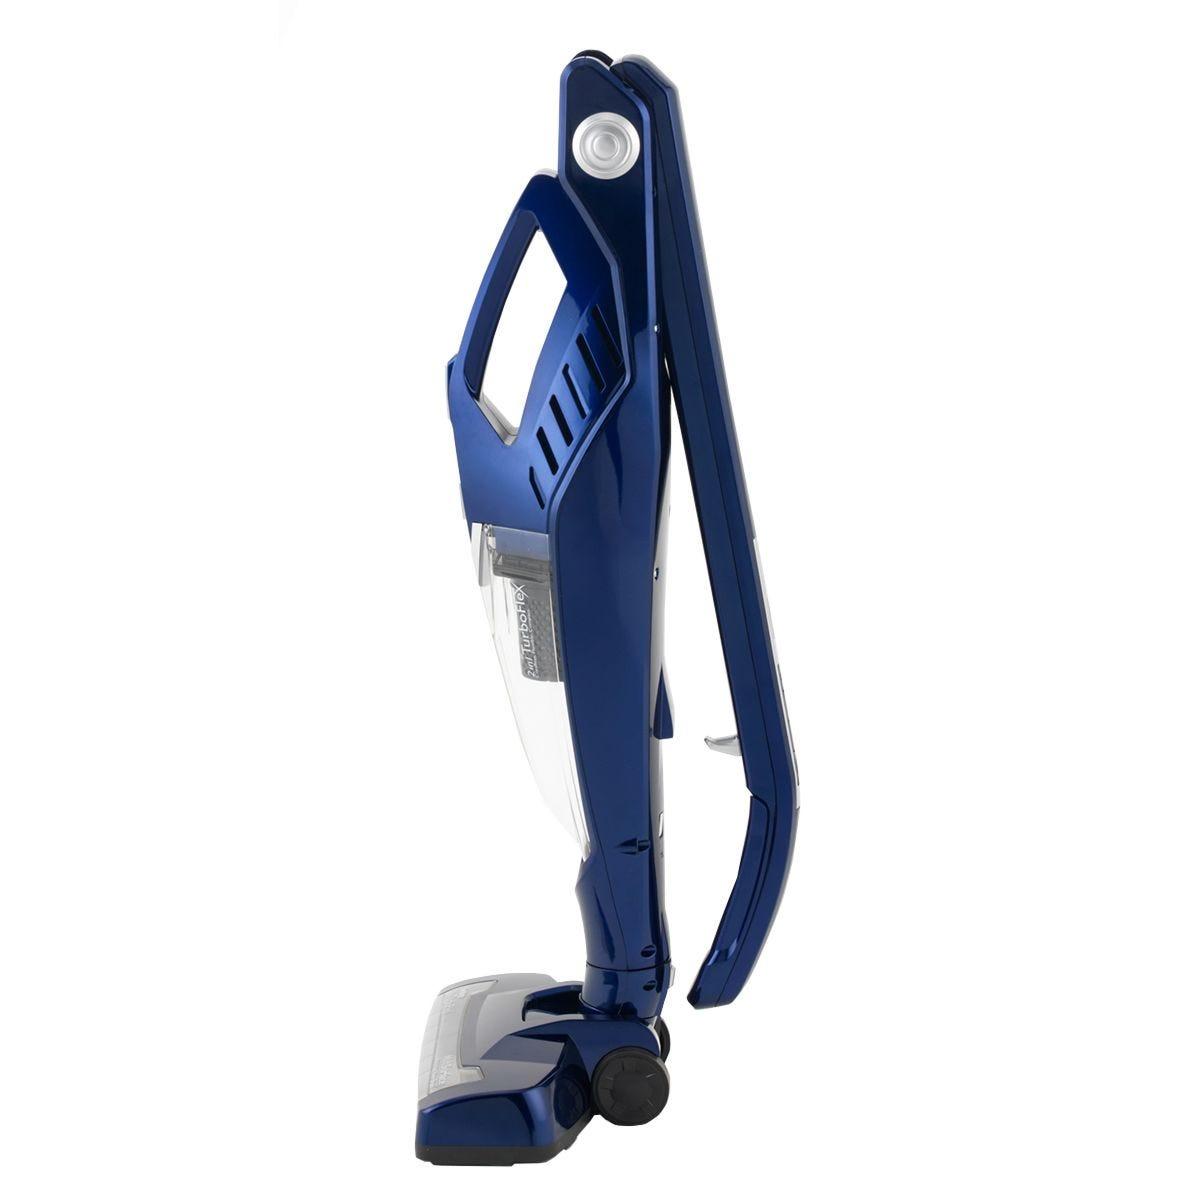 Beldray BEL0738 2-in-1 Turbo Flex Cordless Vacuum Cleaner - Blue